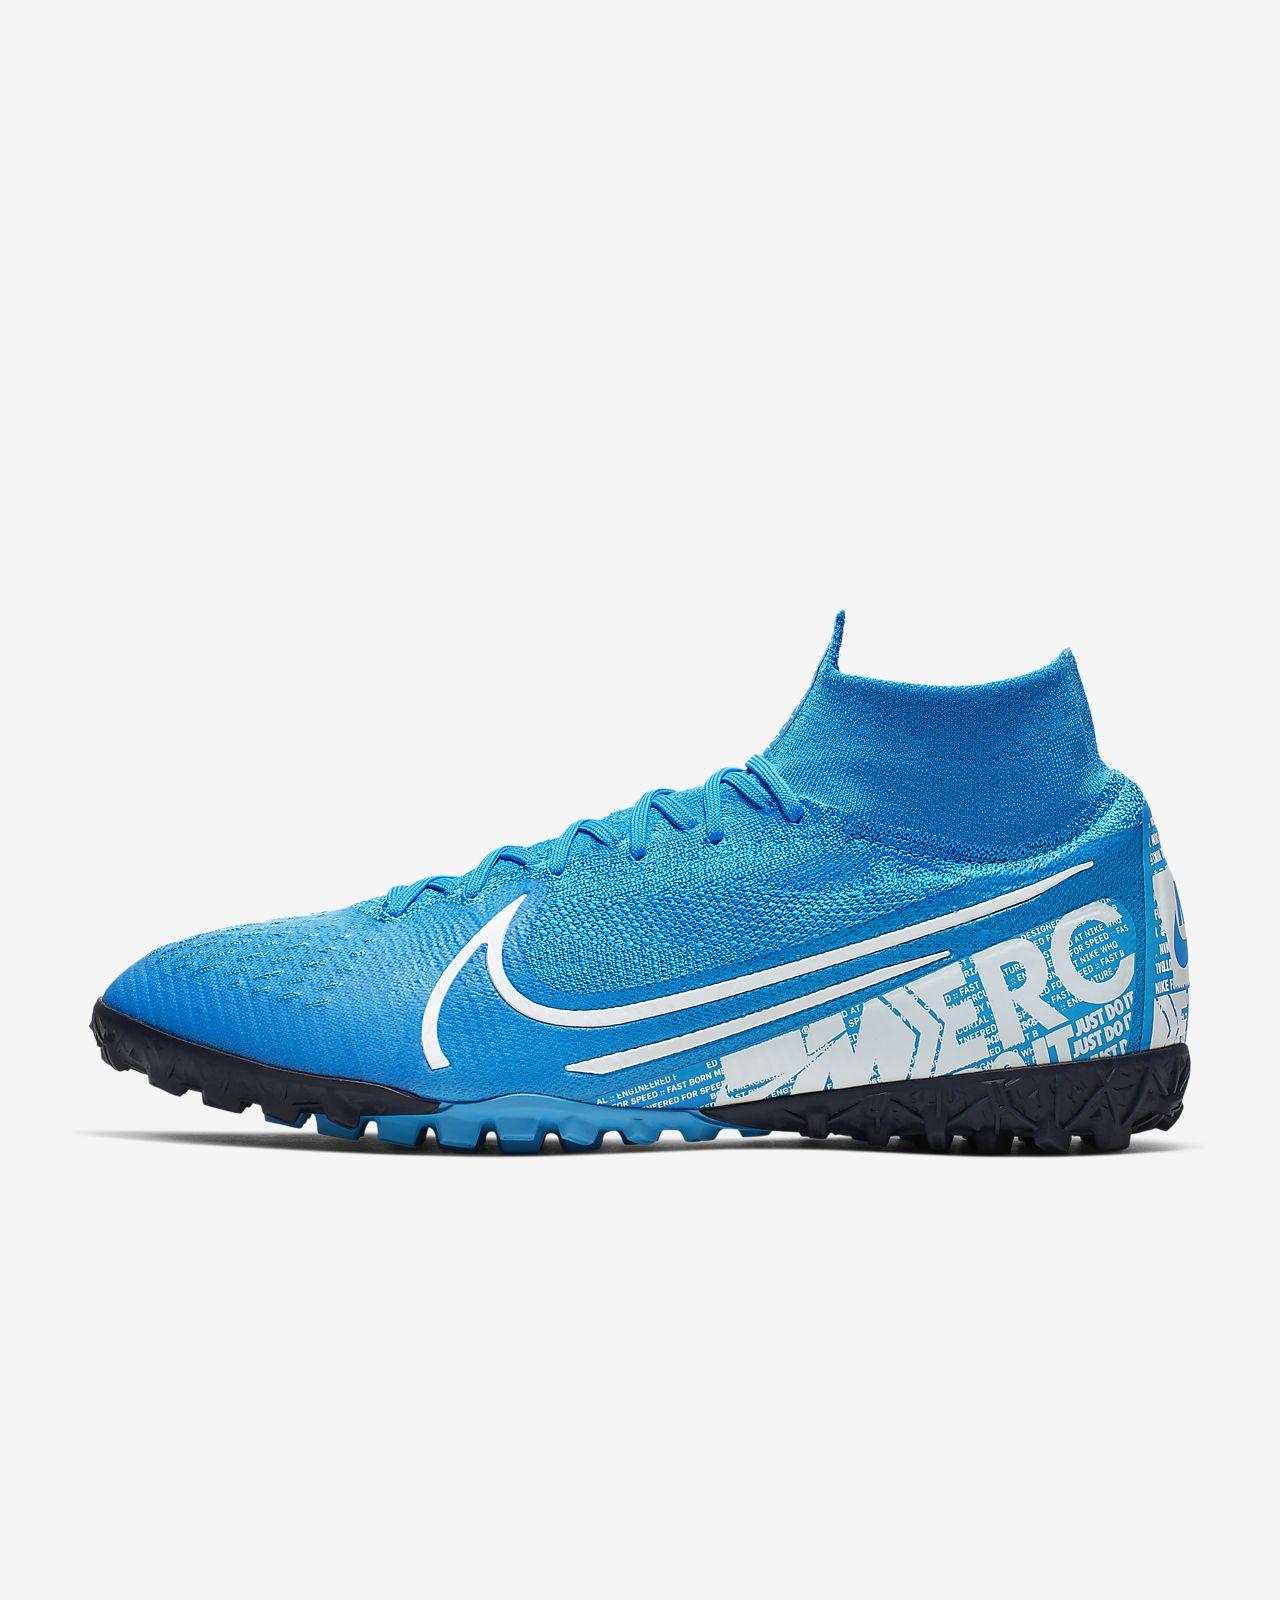 half off b8cb2 7d9a0 Nike Mercurial Superfly 7 Elite TF Artificial-Turf Football Shoe